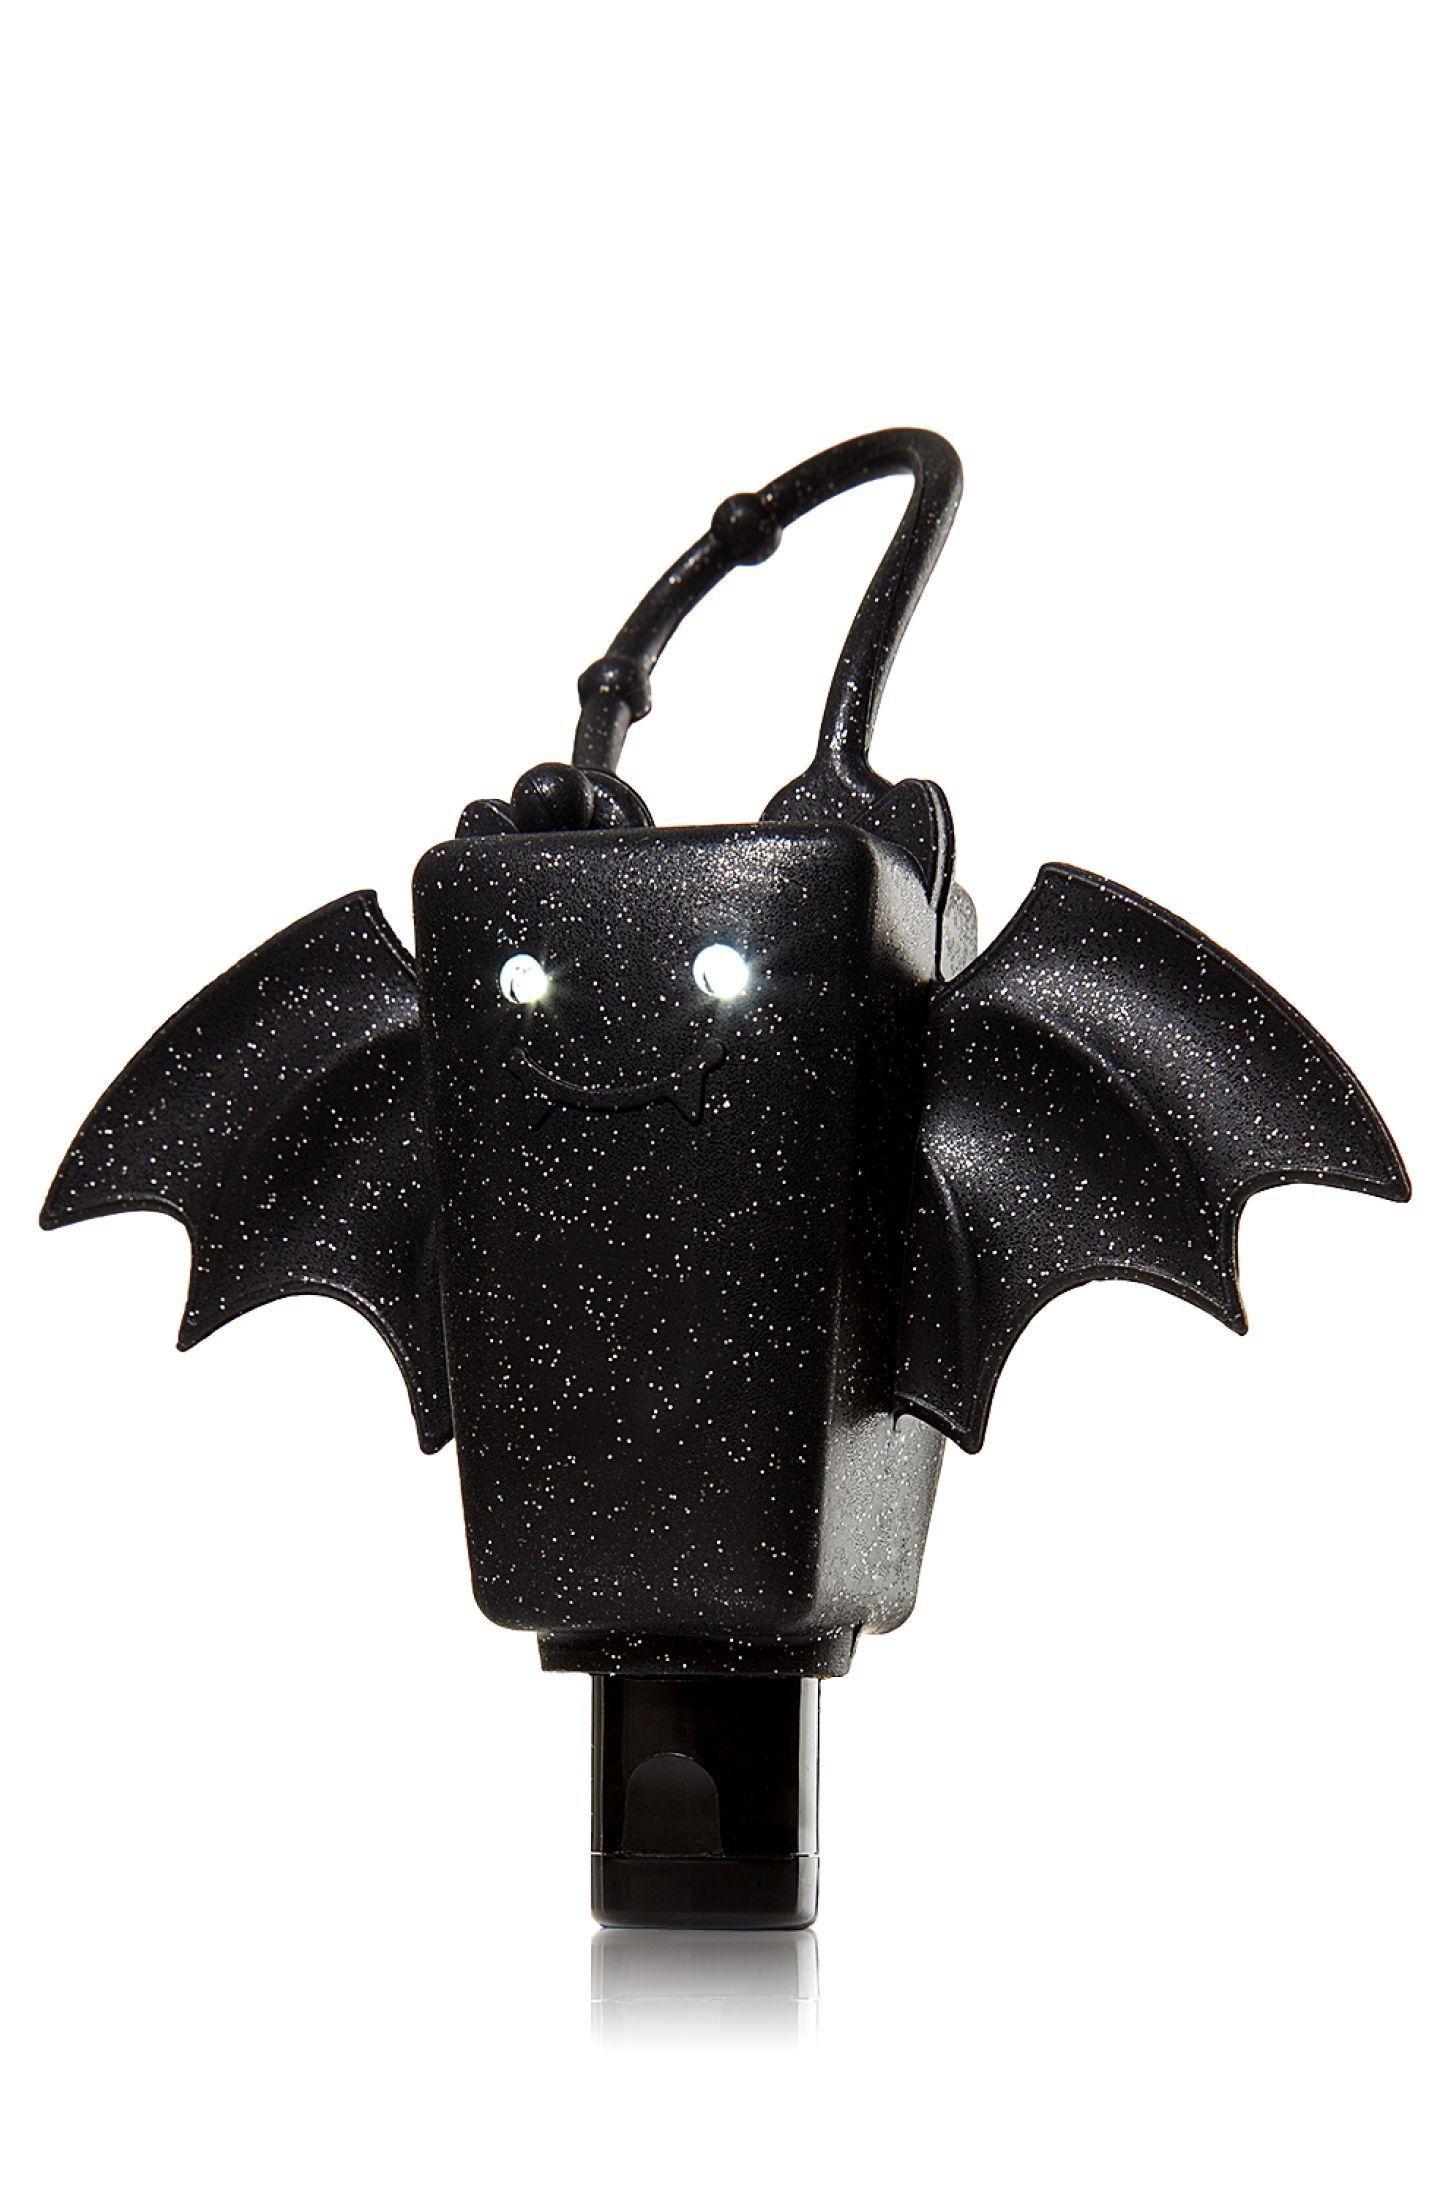 Bat Light Up Pocketbac Holder Bath Body Works Drive Germs